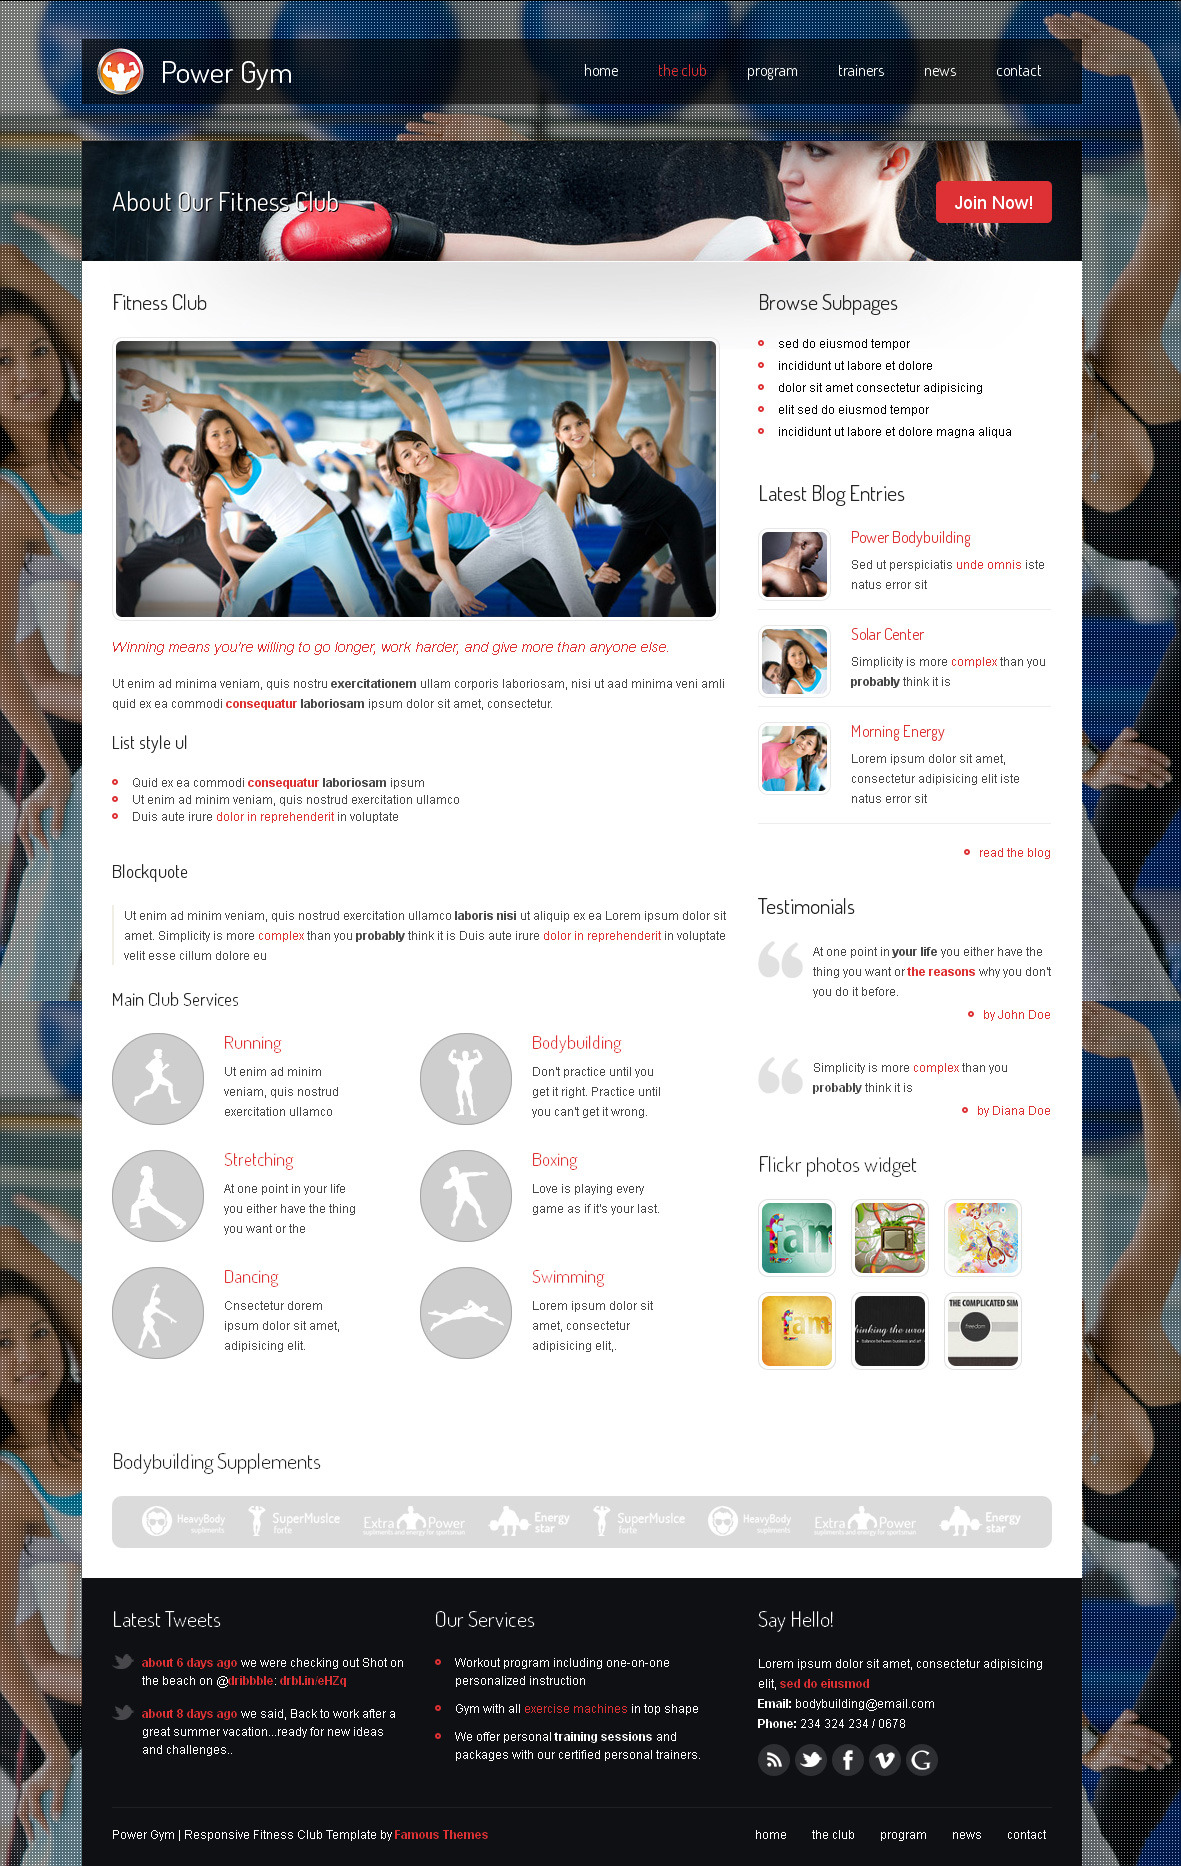 Power Gym - Responsive Wordpress Theme - details page design